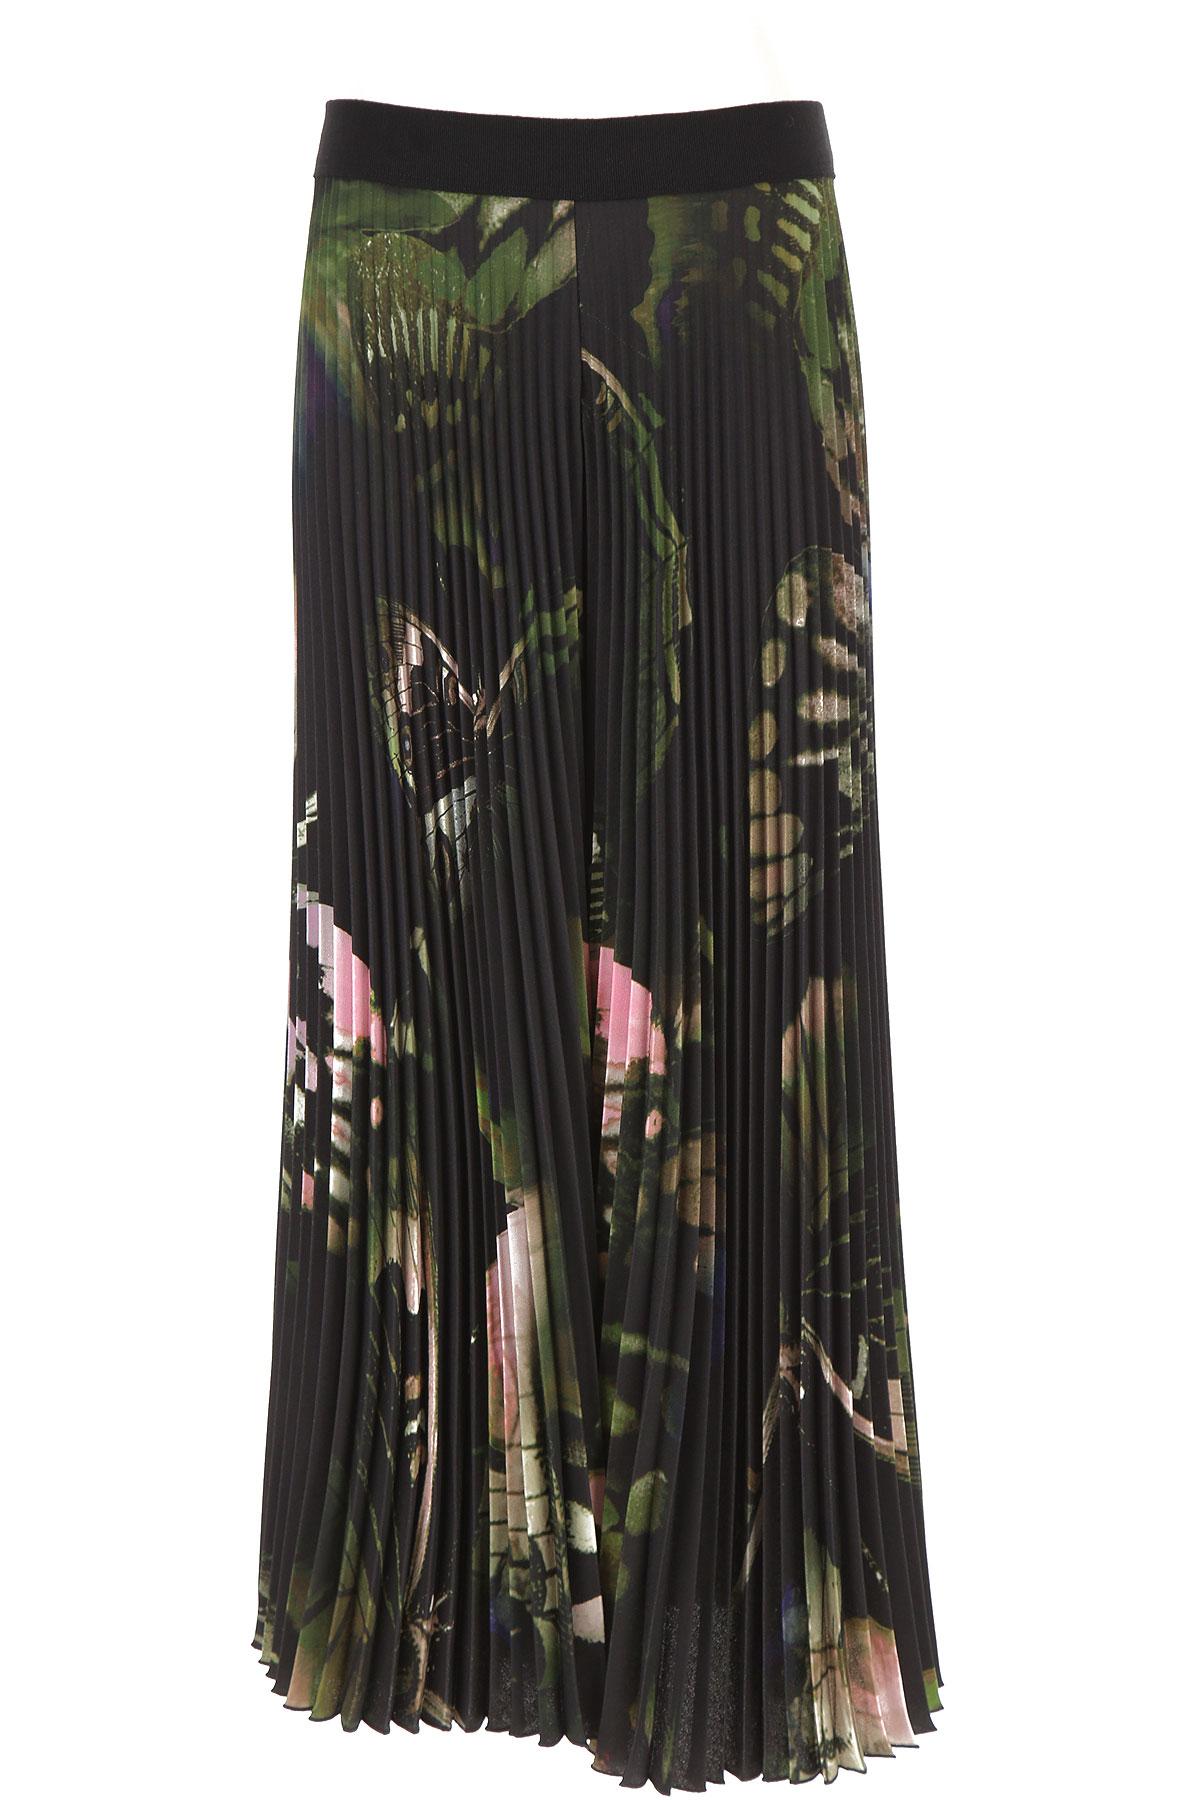 Fuzzi Pants for Women On Sale, Black, polyester, 2019, 26 28